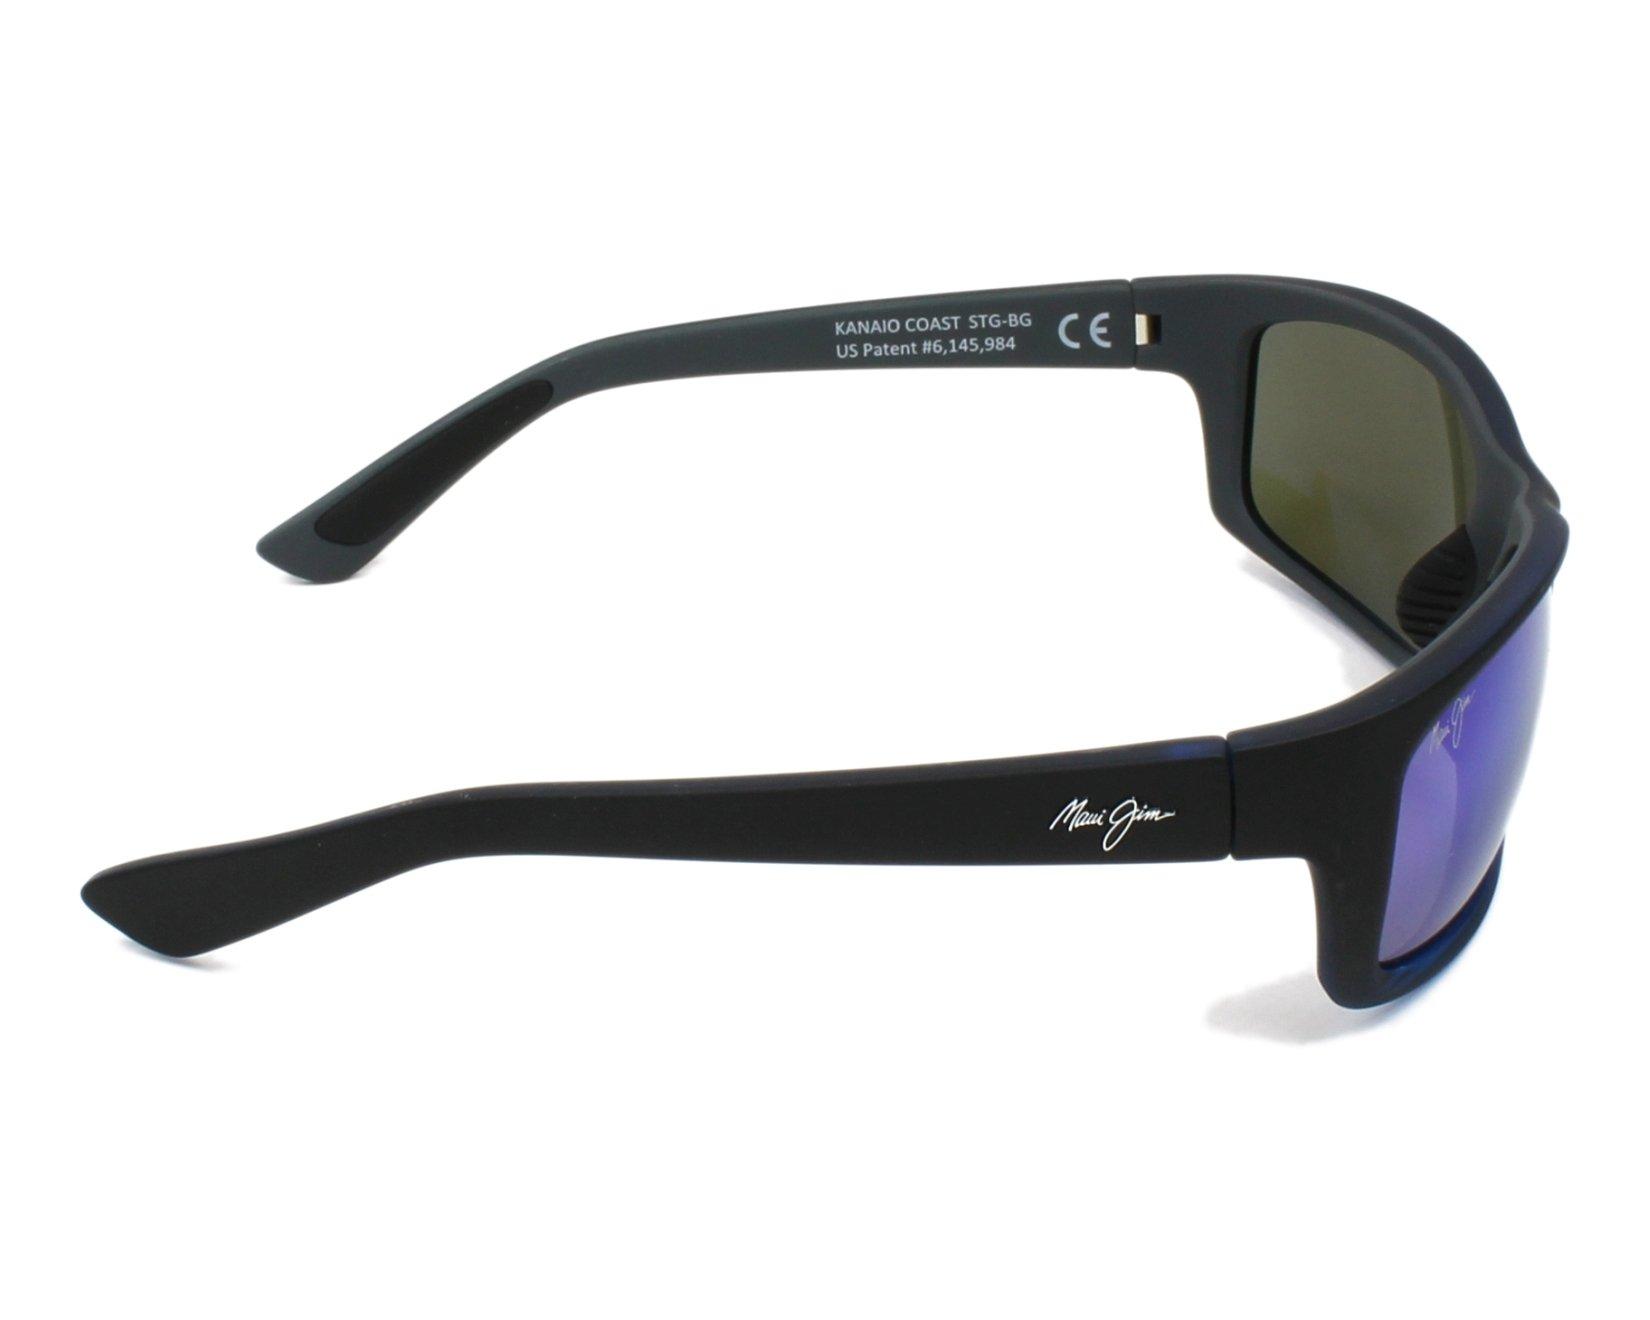 a85d0e3e41 Sunglasses Maui Jim B-766 08C 61-17 Black side view